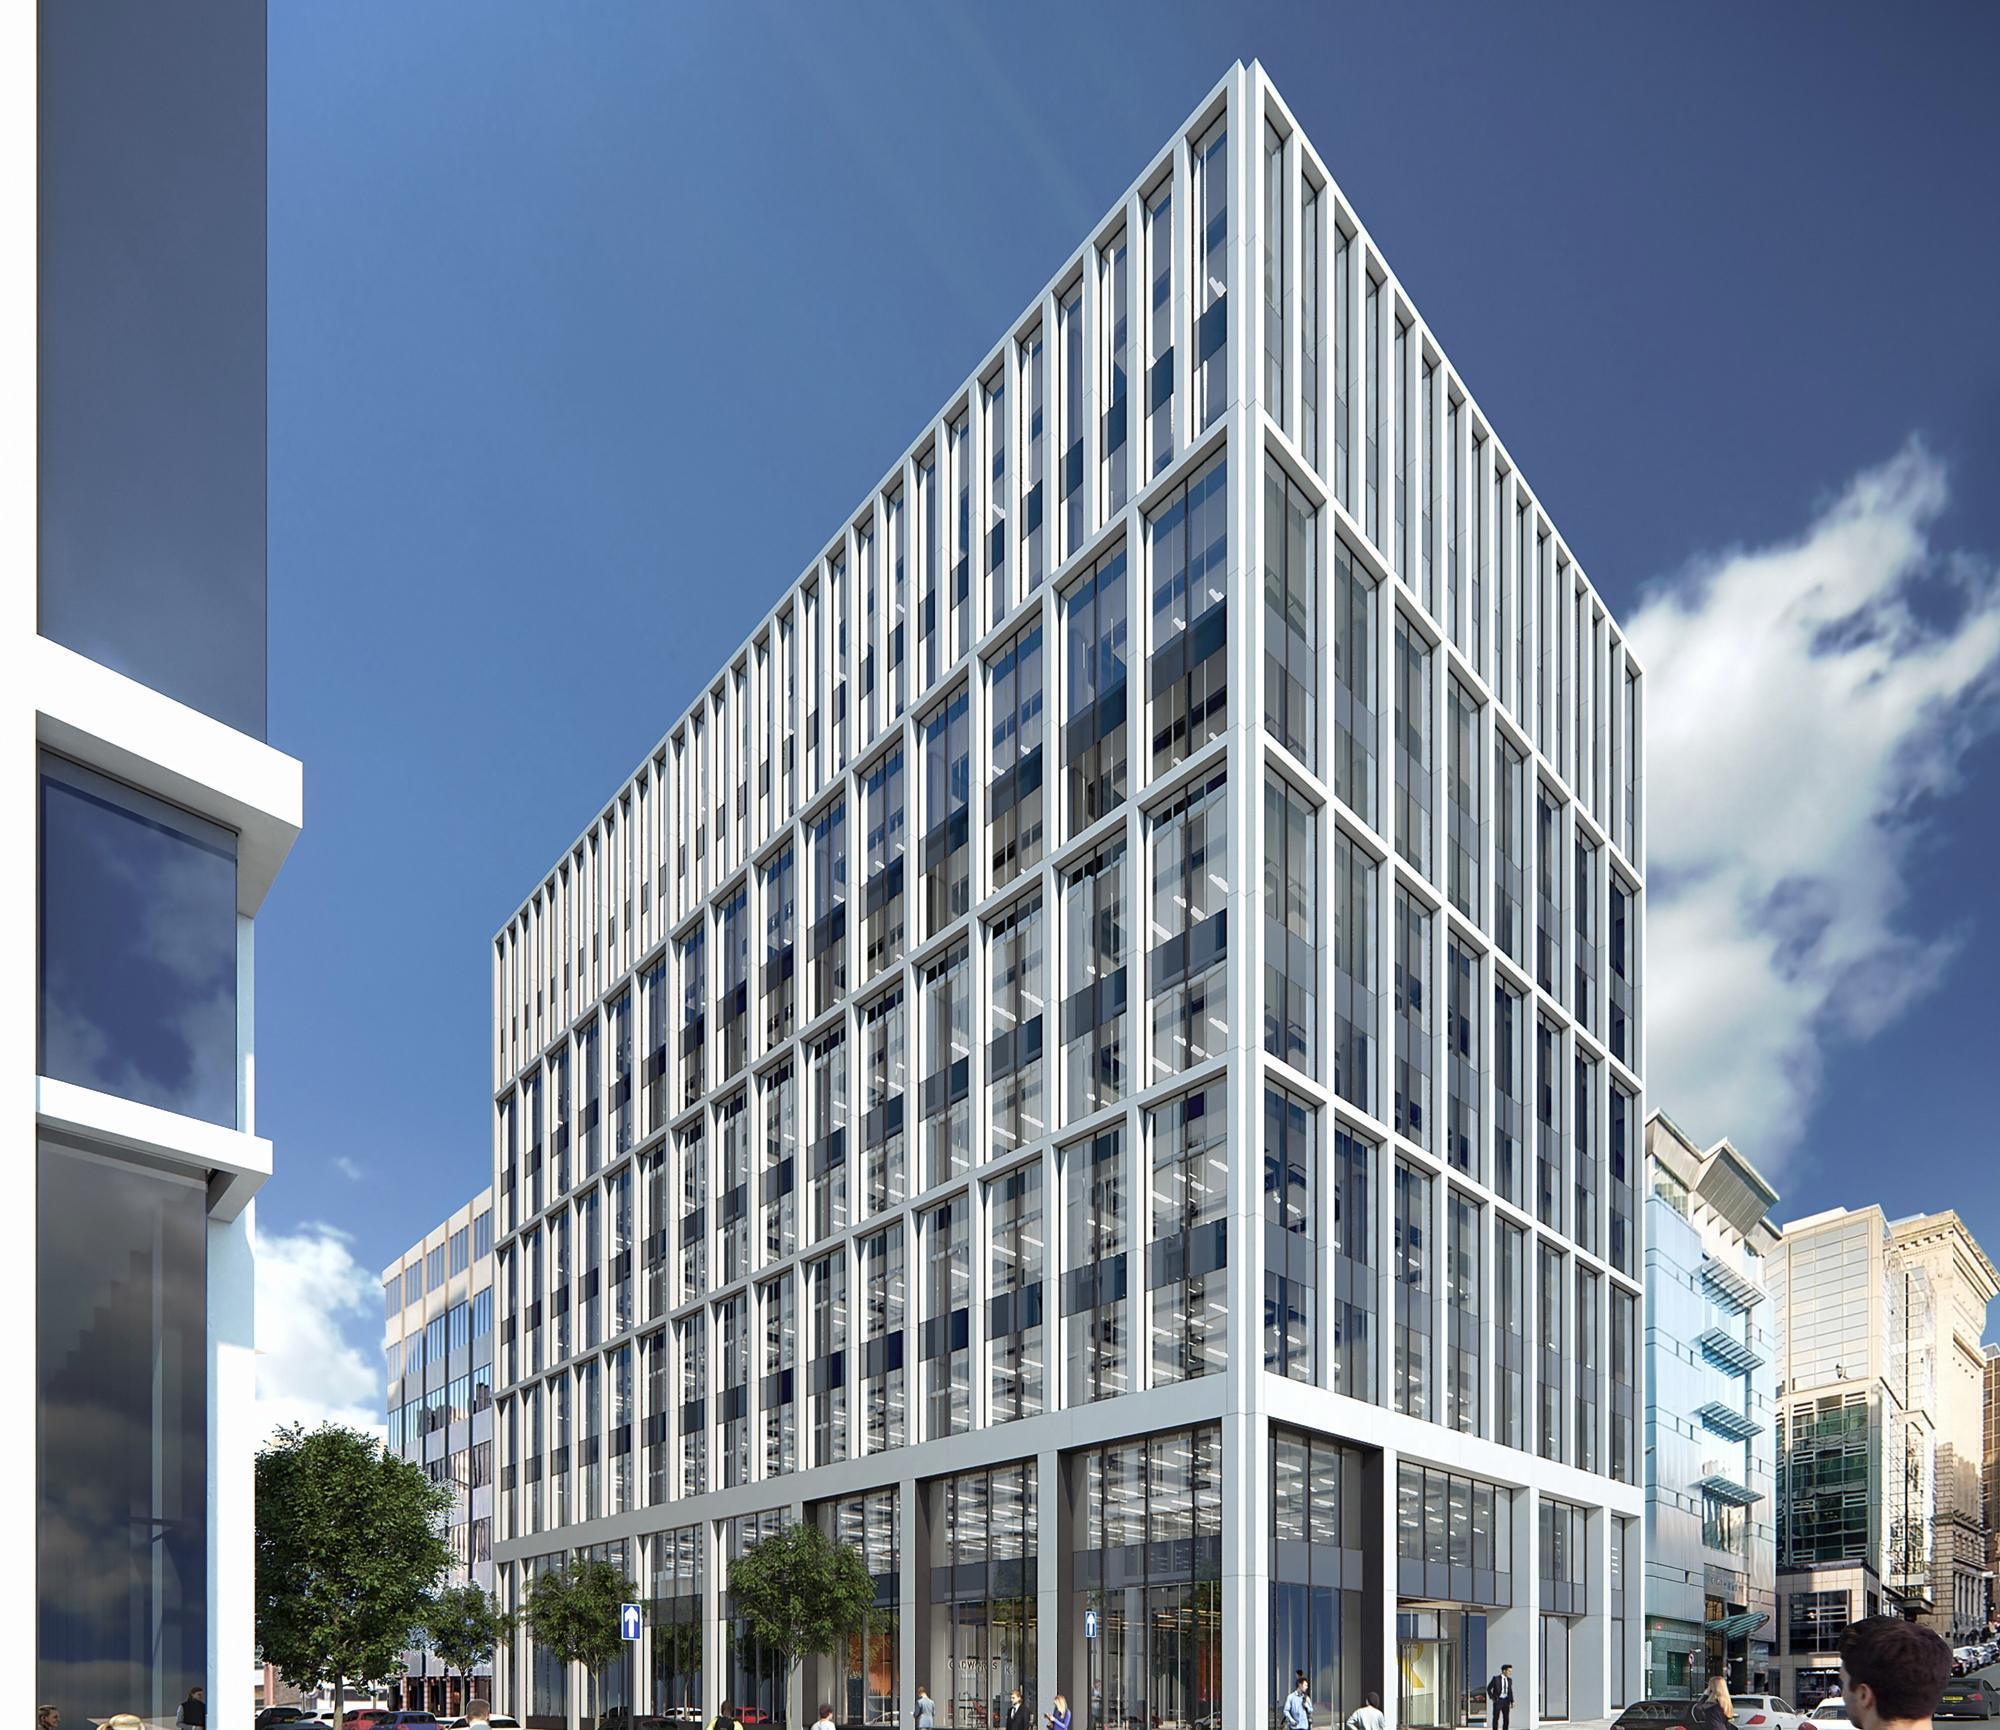 Bowmer & Kirkland Wins £23m Glasgow Office Scheme